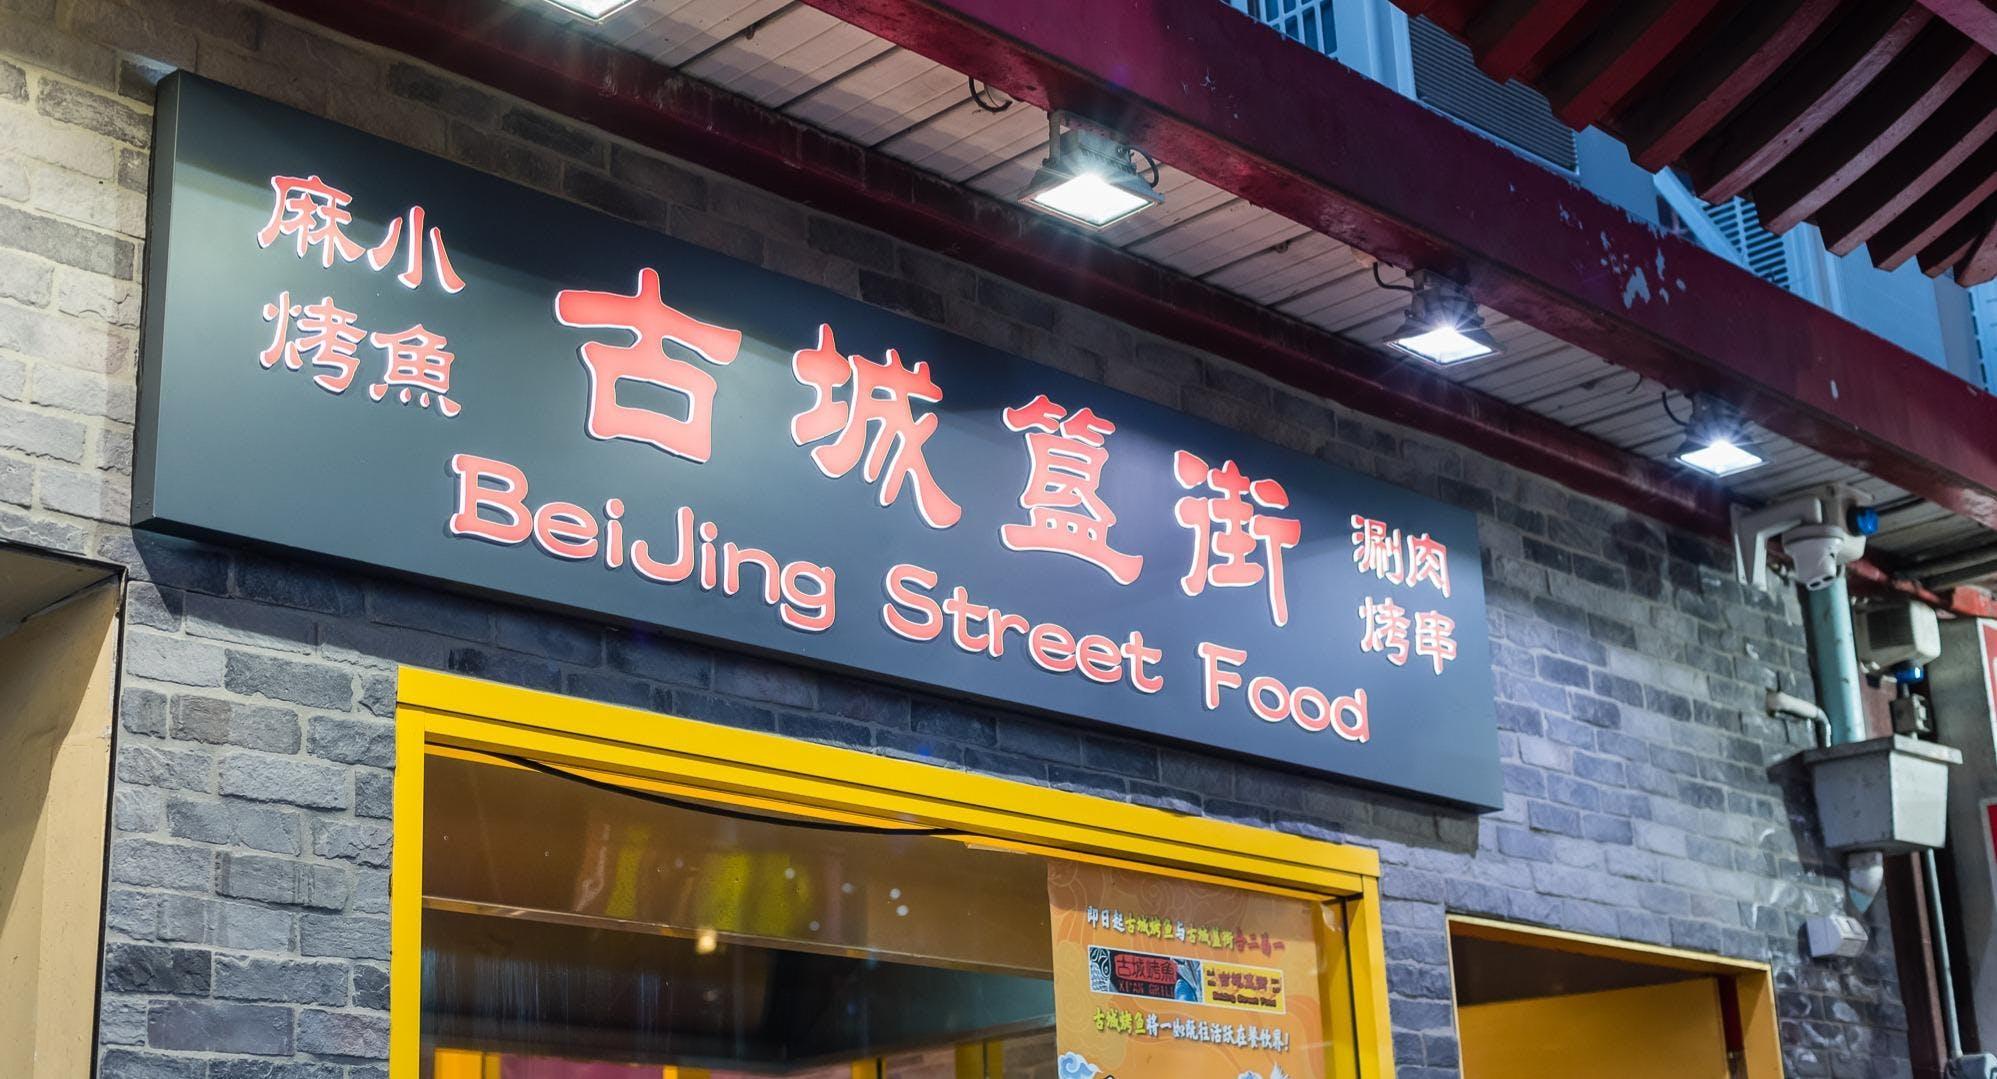 Beijing Street Food Grill Fish 古城簋街 烤鱼 Sydney image 3